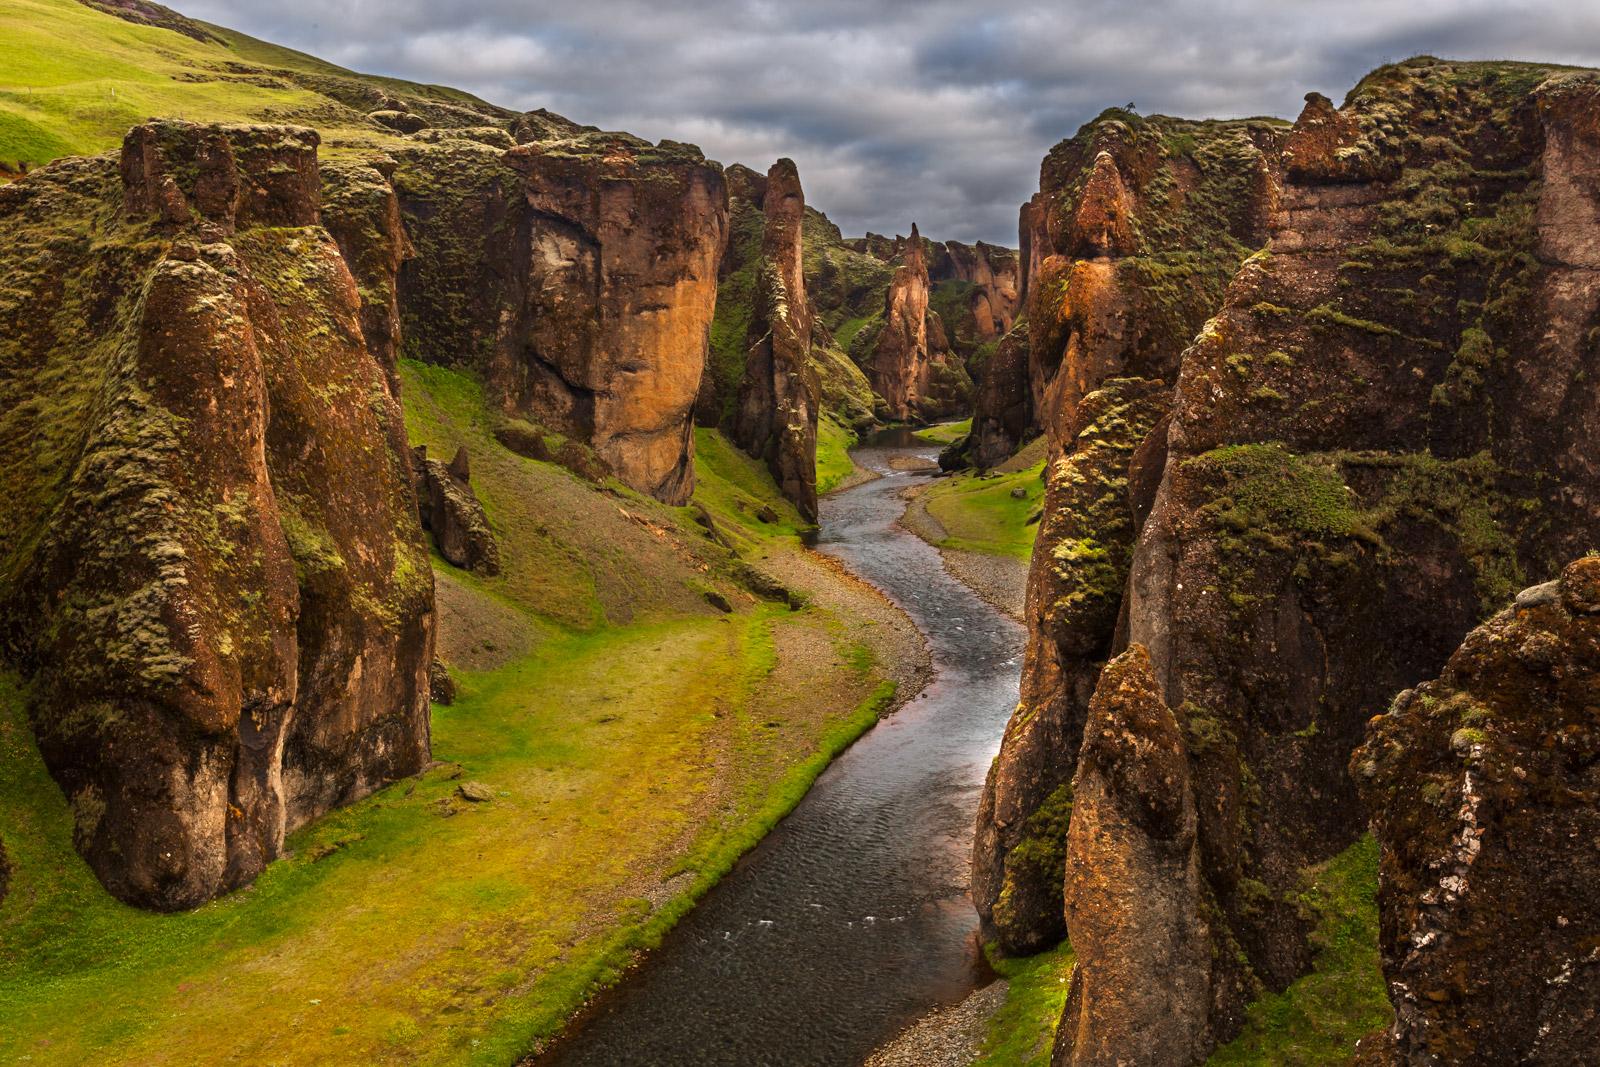 iceland, fjaorargljufur, canyon, limited edition, photograph, fine art, landscape, photo